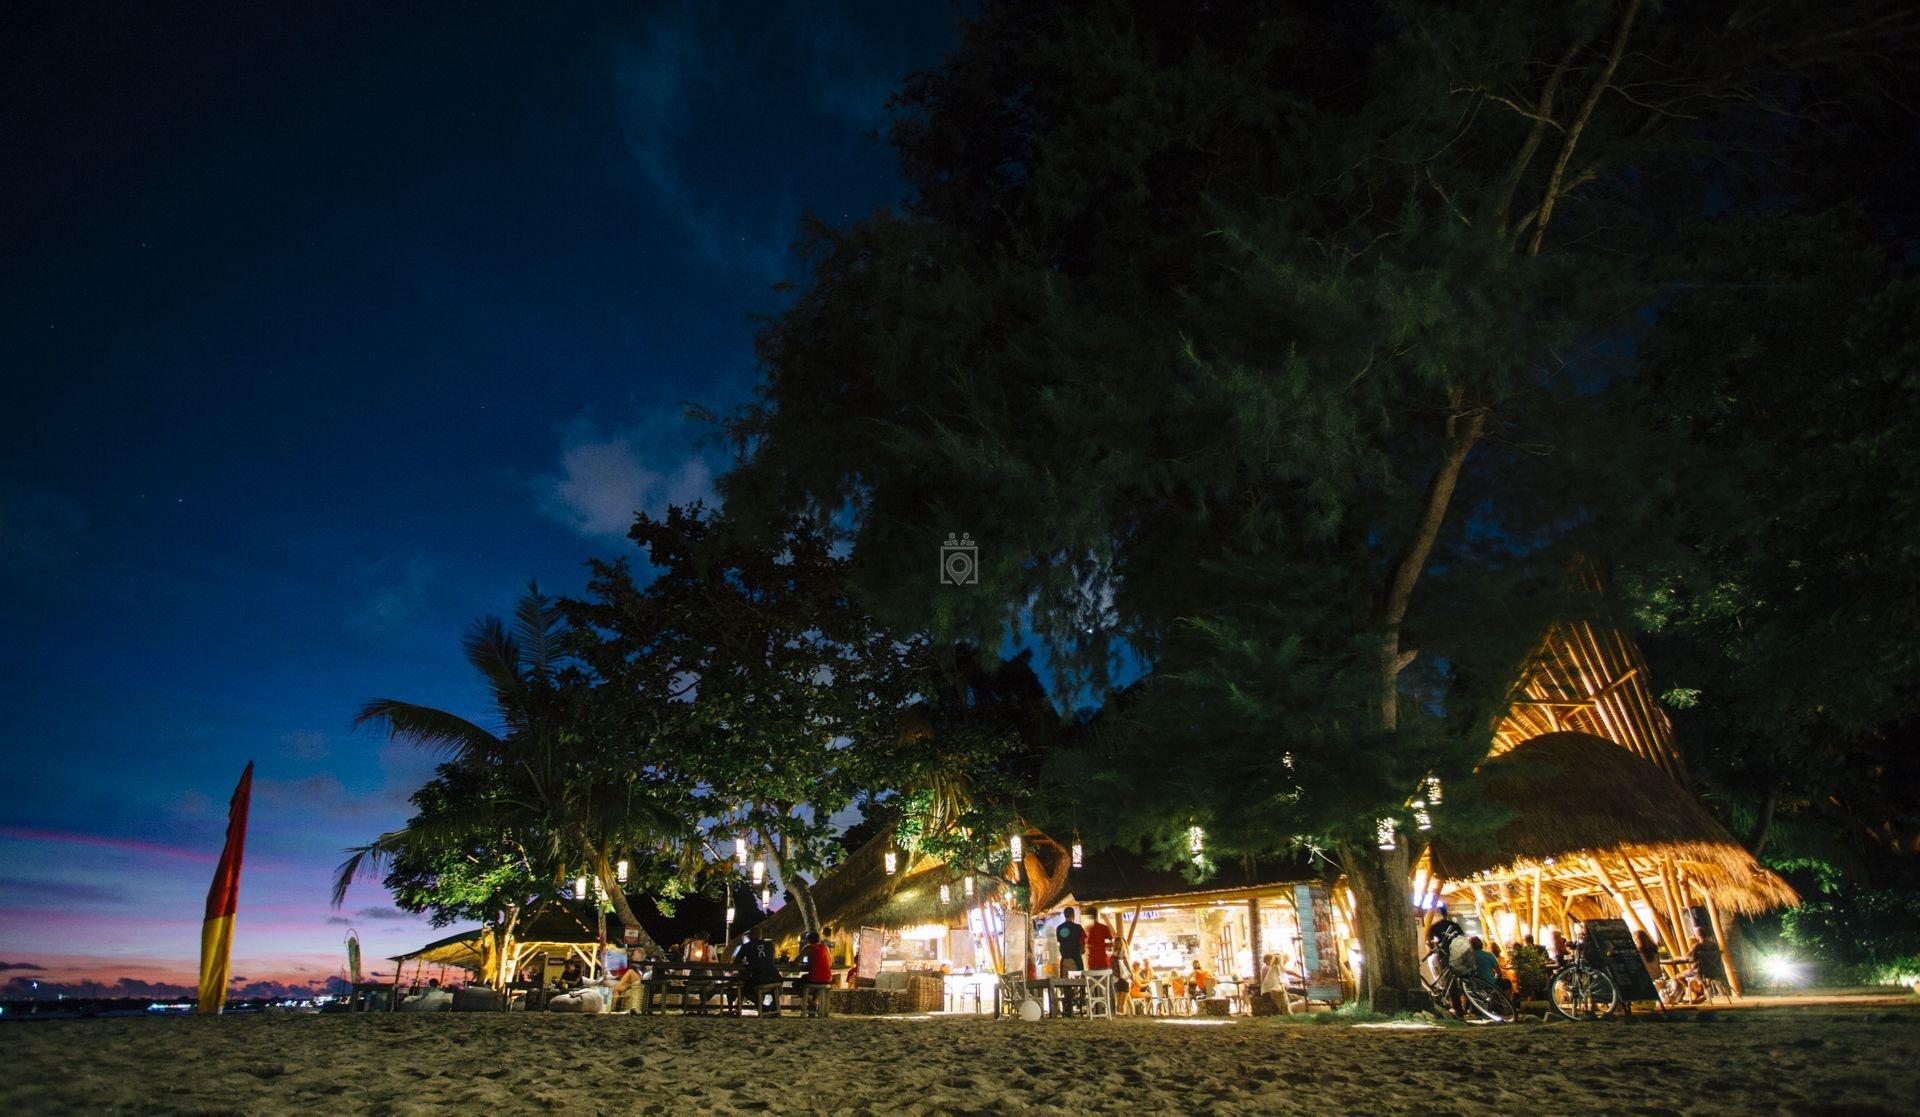 Genius Café Sanur, Bali - Book Online - Coworker